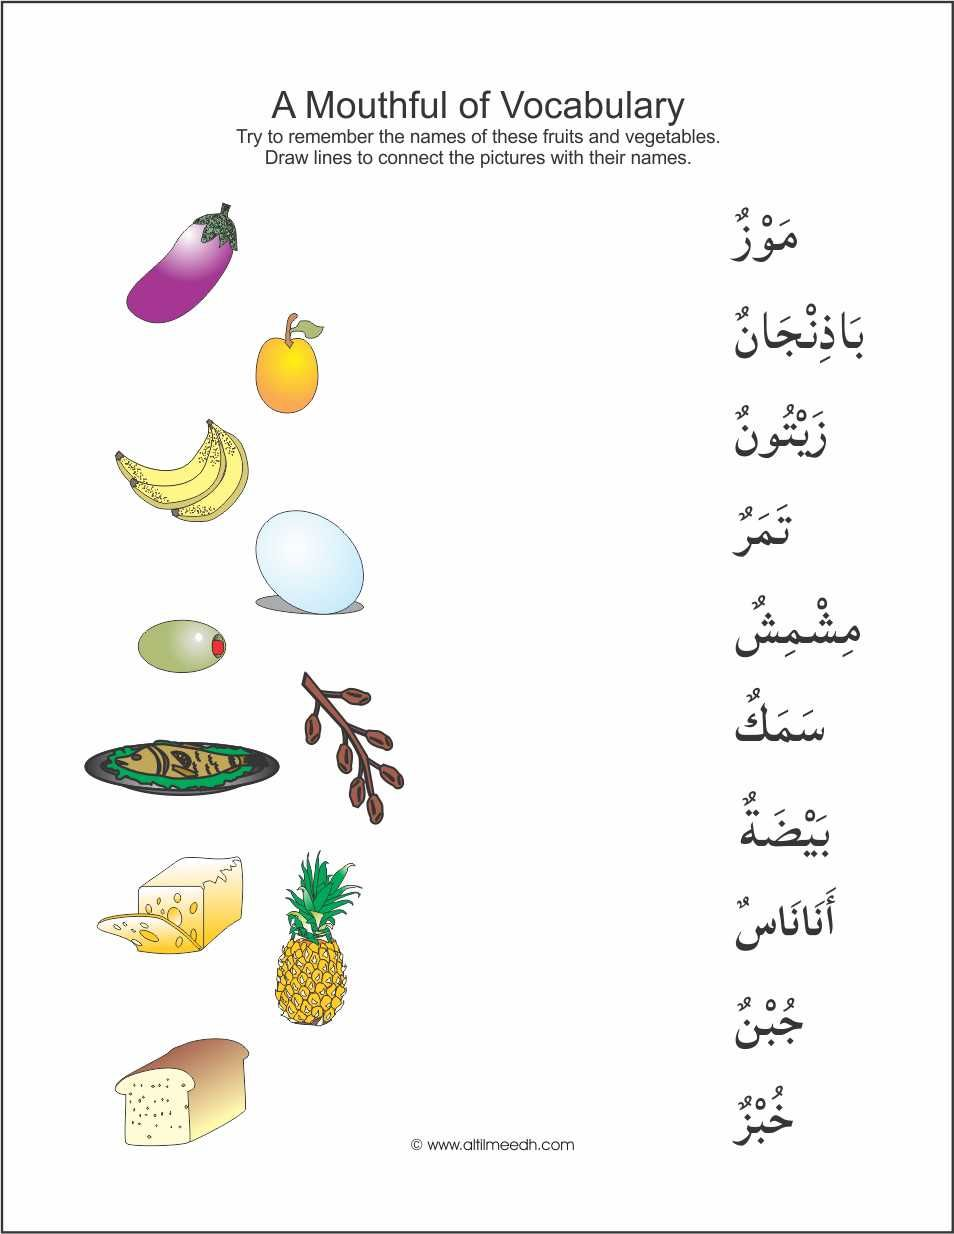 Mouthful of Vocabulary image 3 | arabic language in 2018 | Pinterest ...